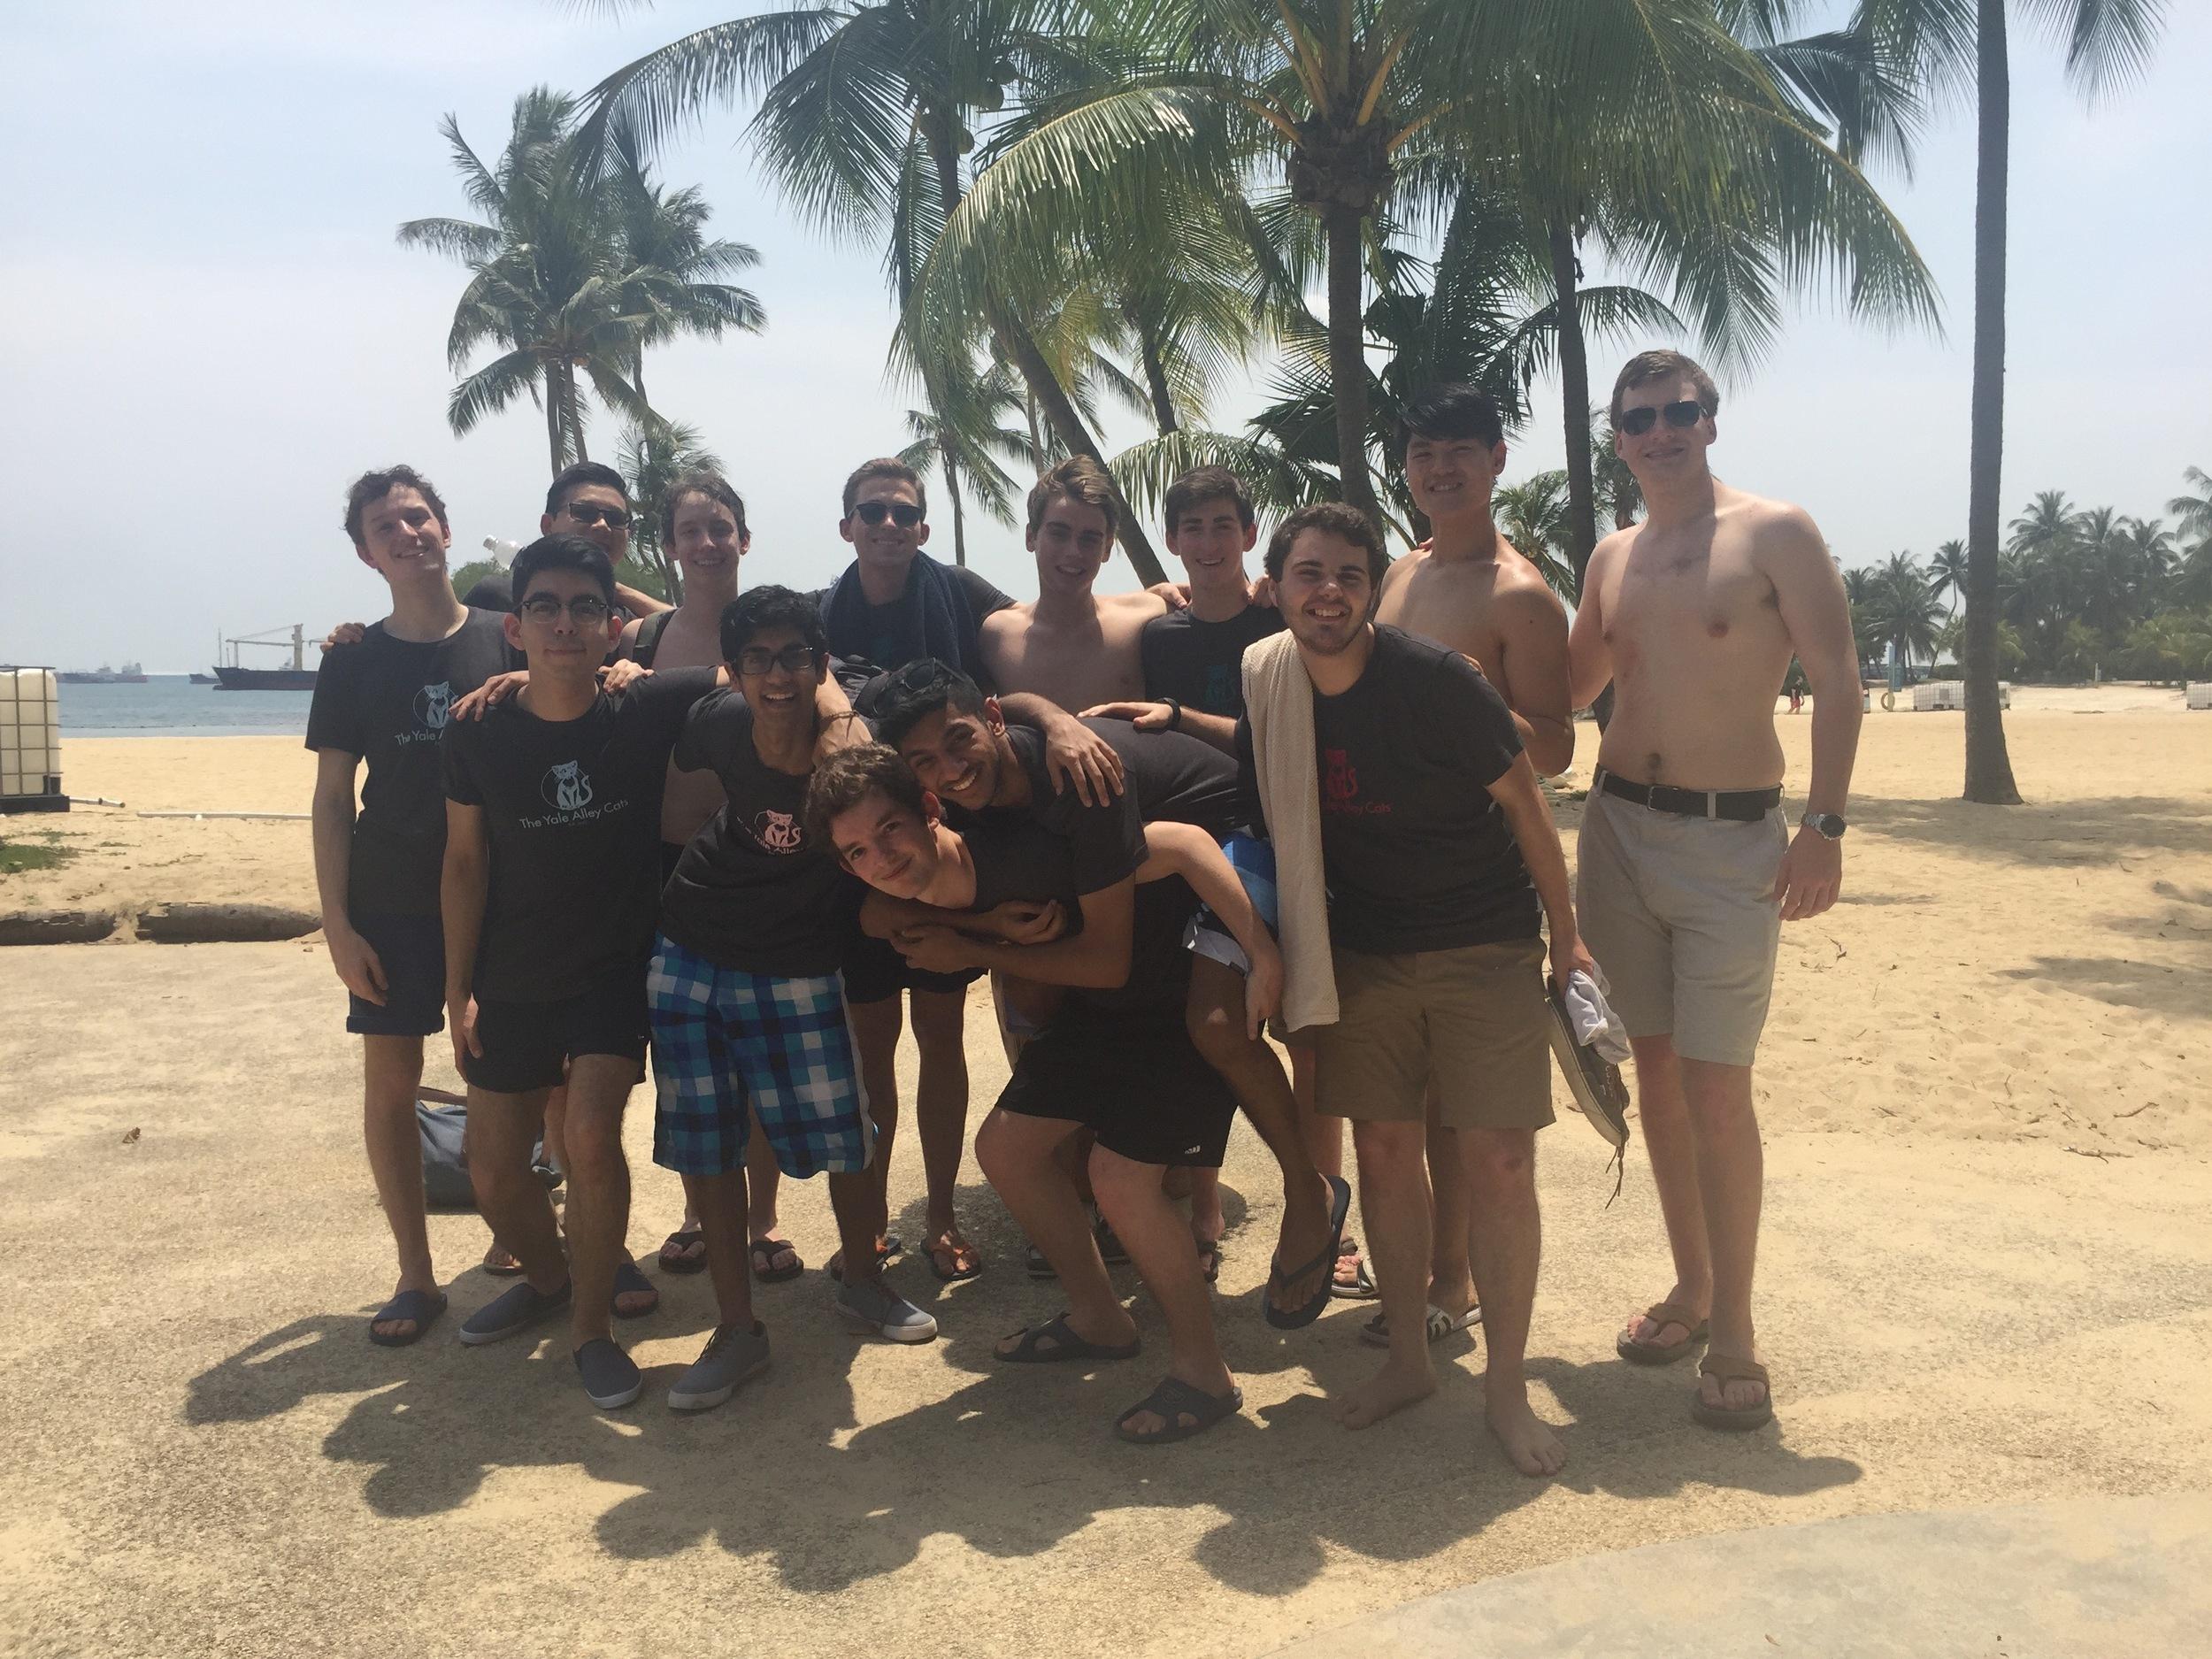 Beach-day madness on Sentosa Island